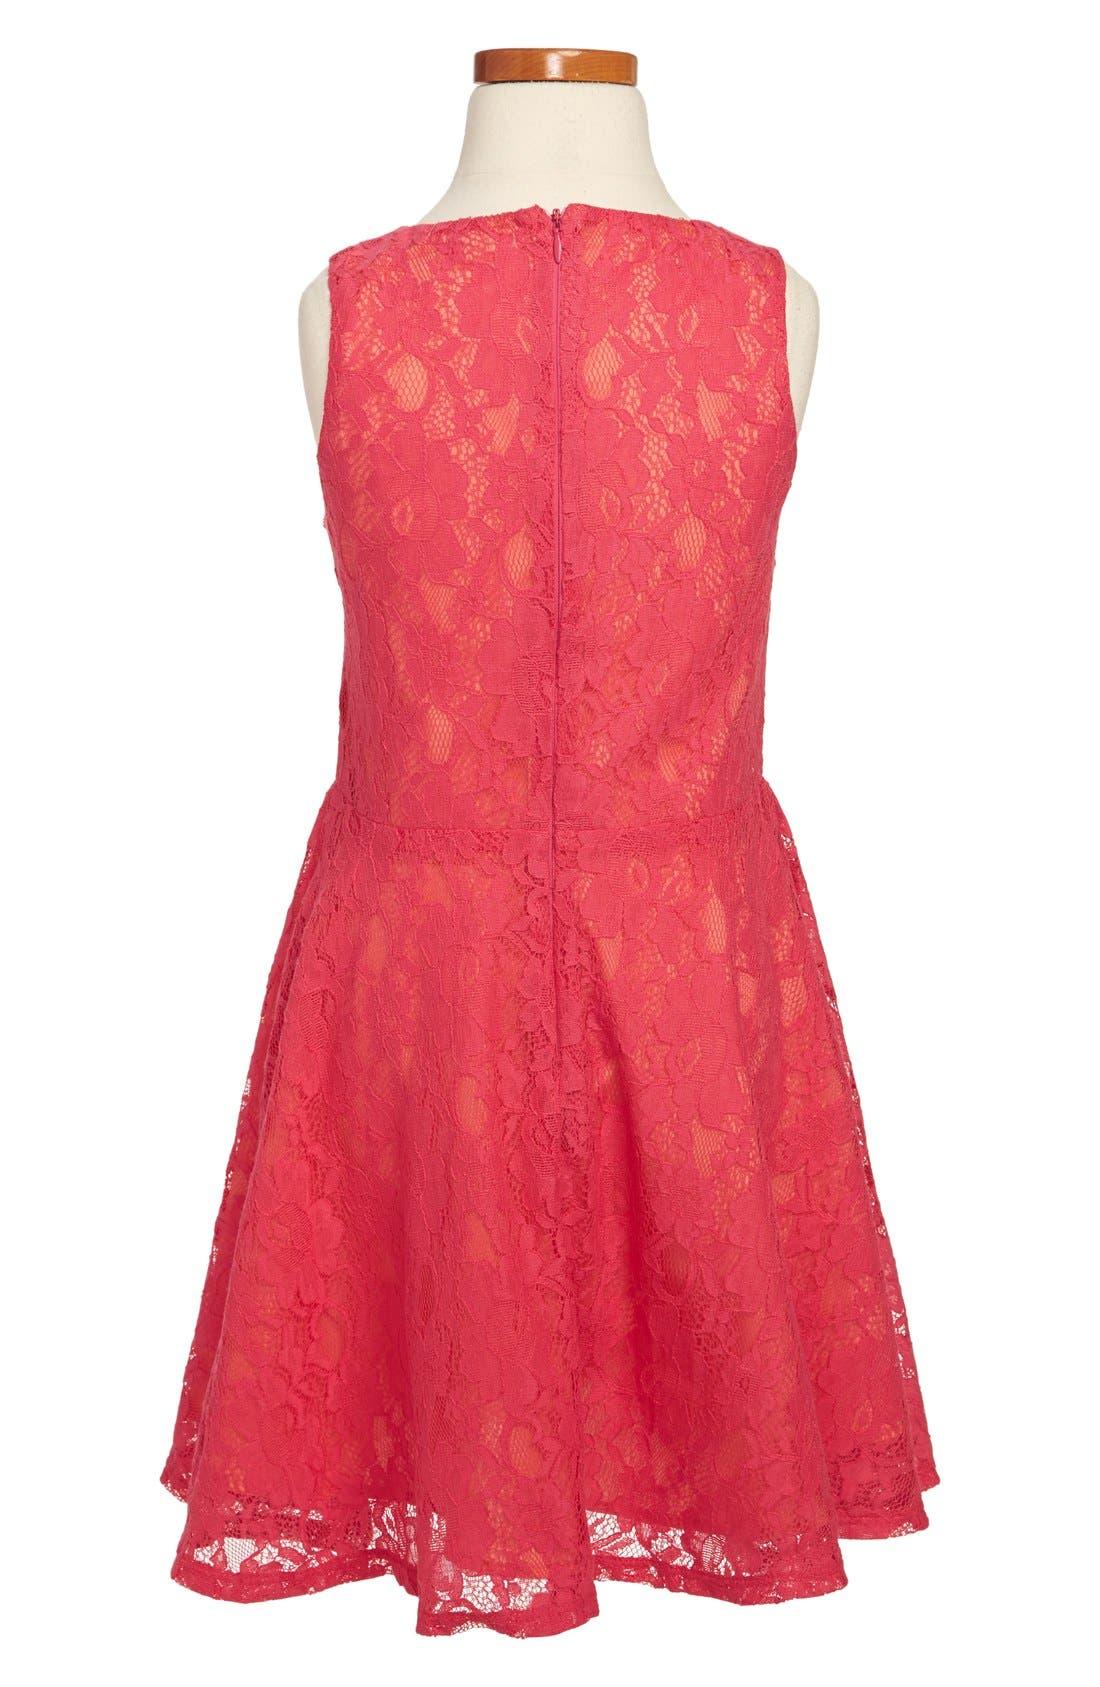 Alternate Image 2  - Miss Behave 'Sofia' Lace Dress (Big Girls)